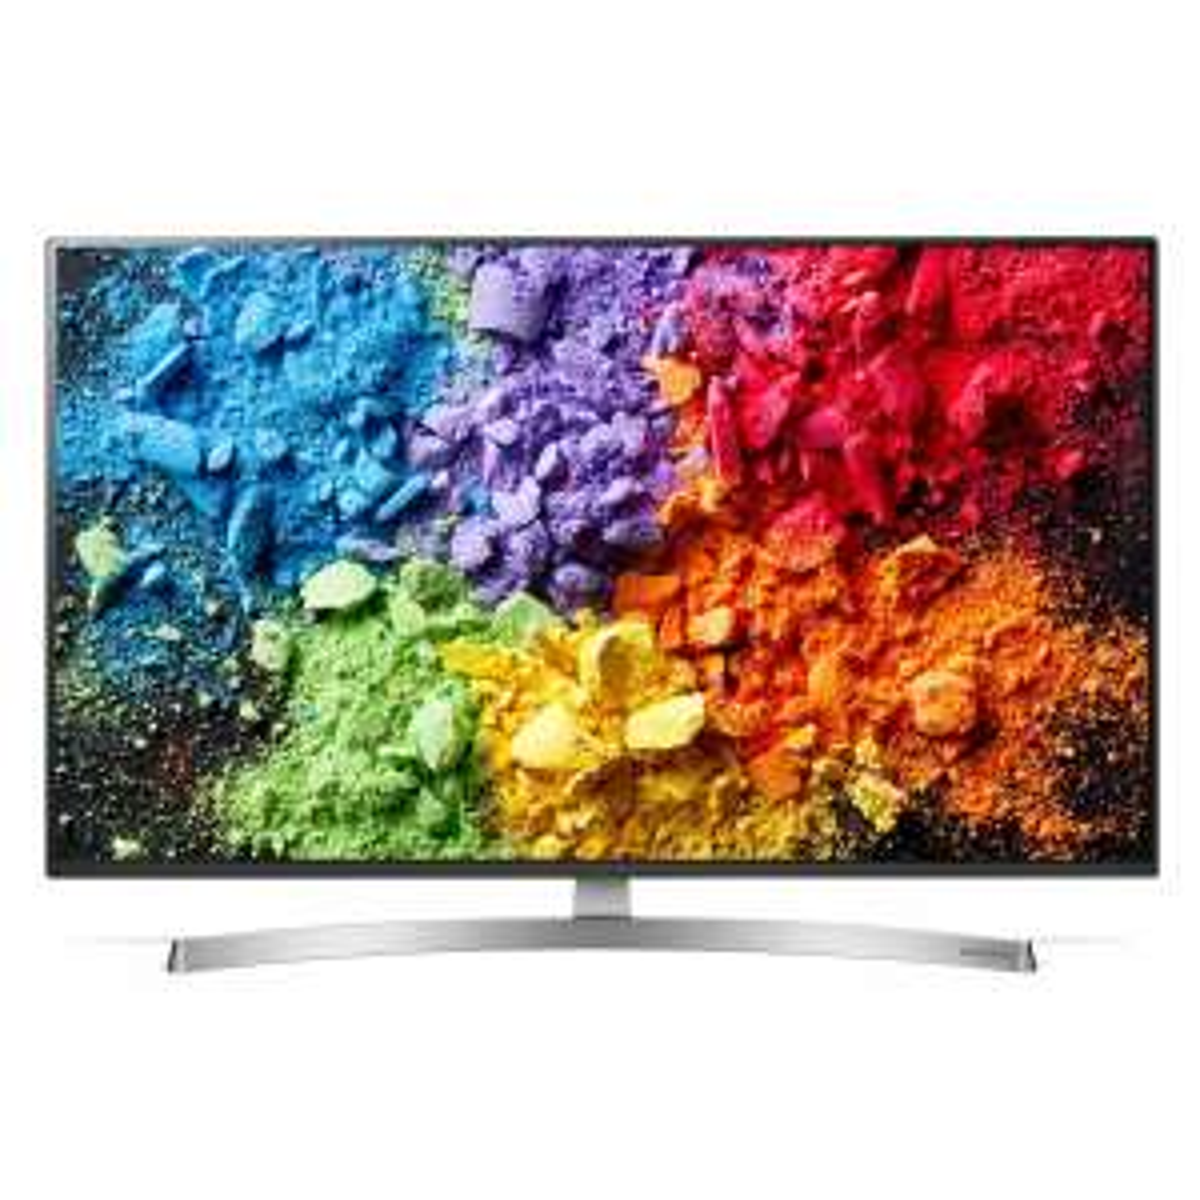 "TV 65"" LG 65SK8500 UHD 4K Nano Cell HDR-10 + 20 films 4K offerts en location (via ODR de 800€)"